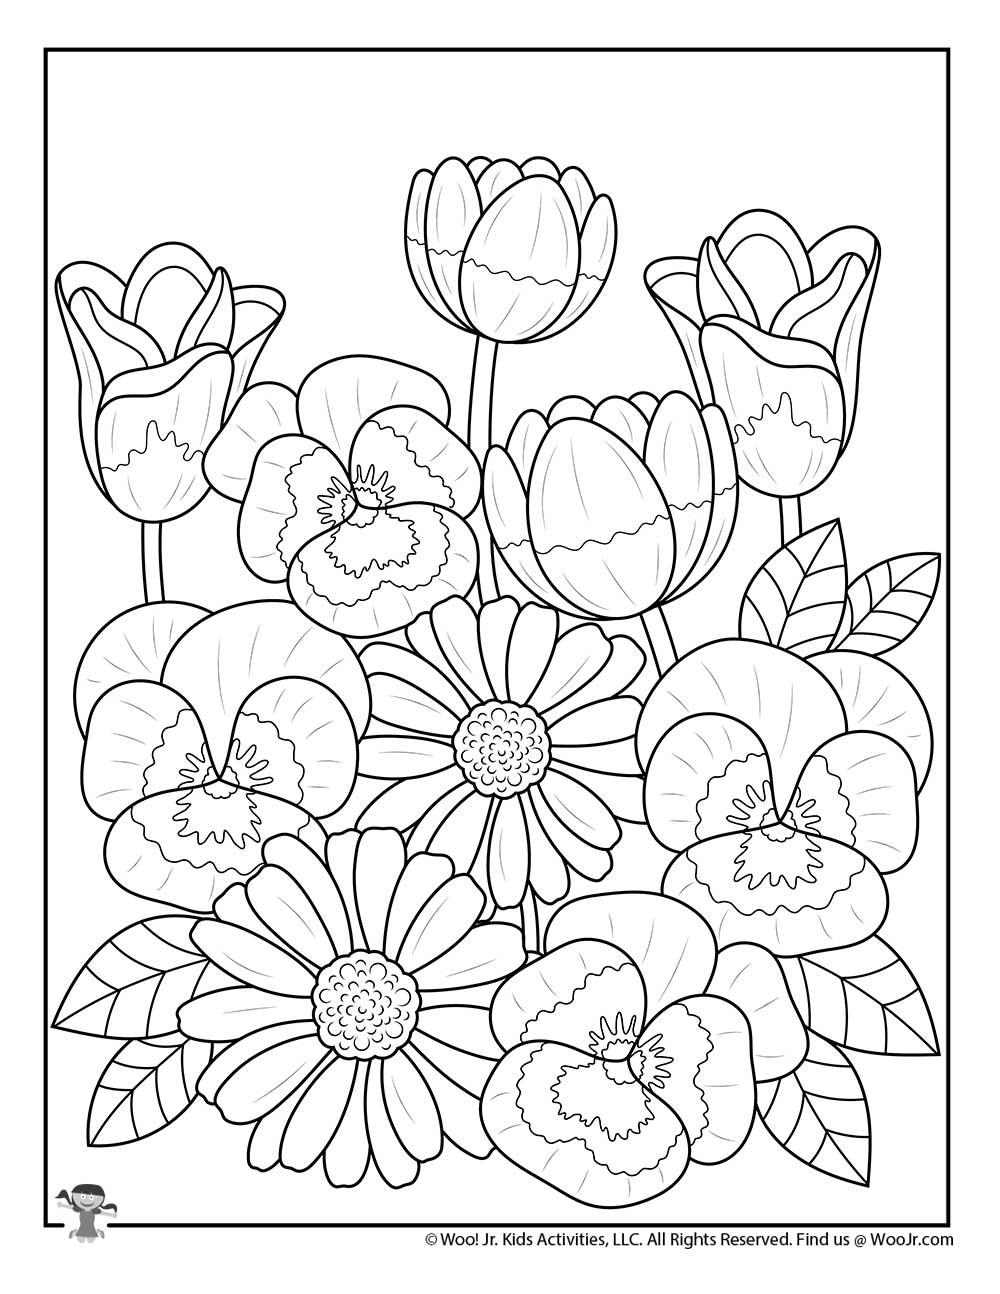 - Flowers For Spring Coloring For Teens Woo! Jr. Kids Activities